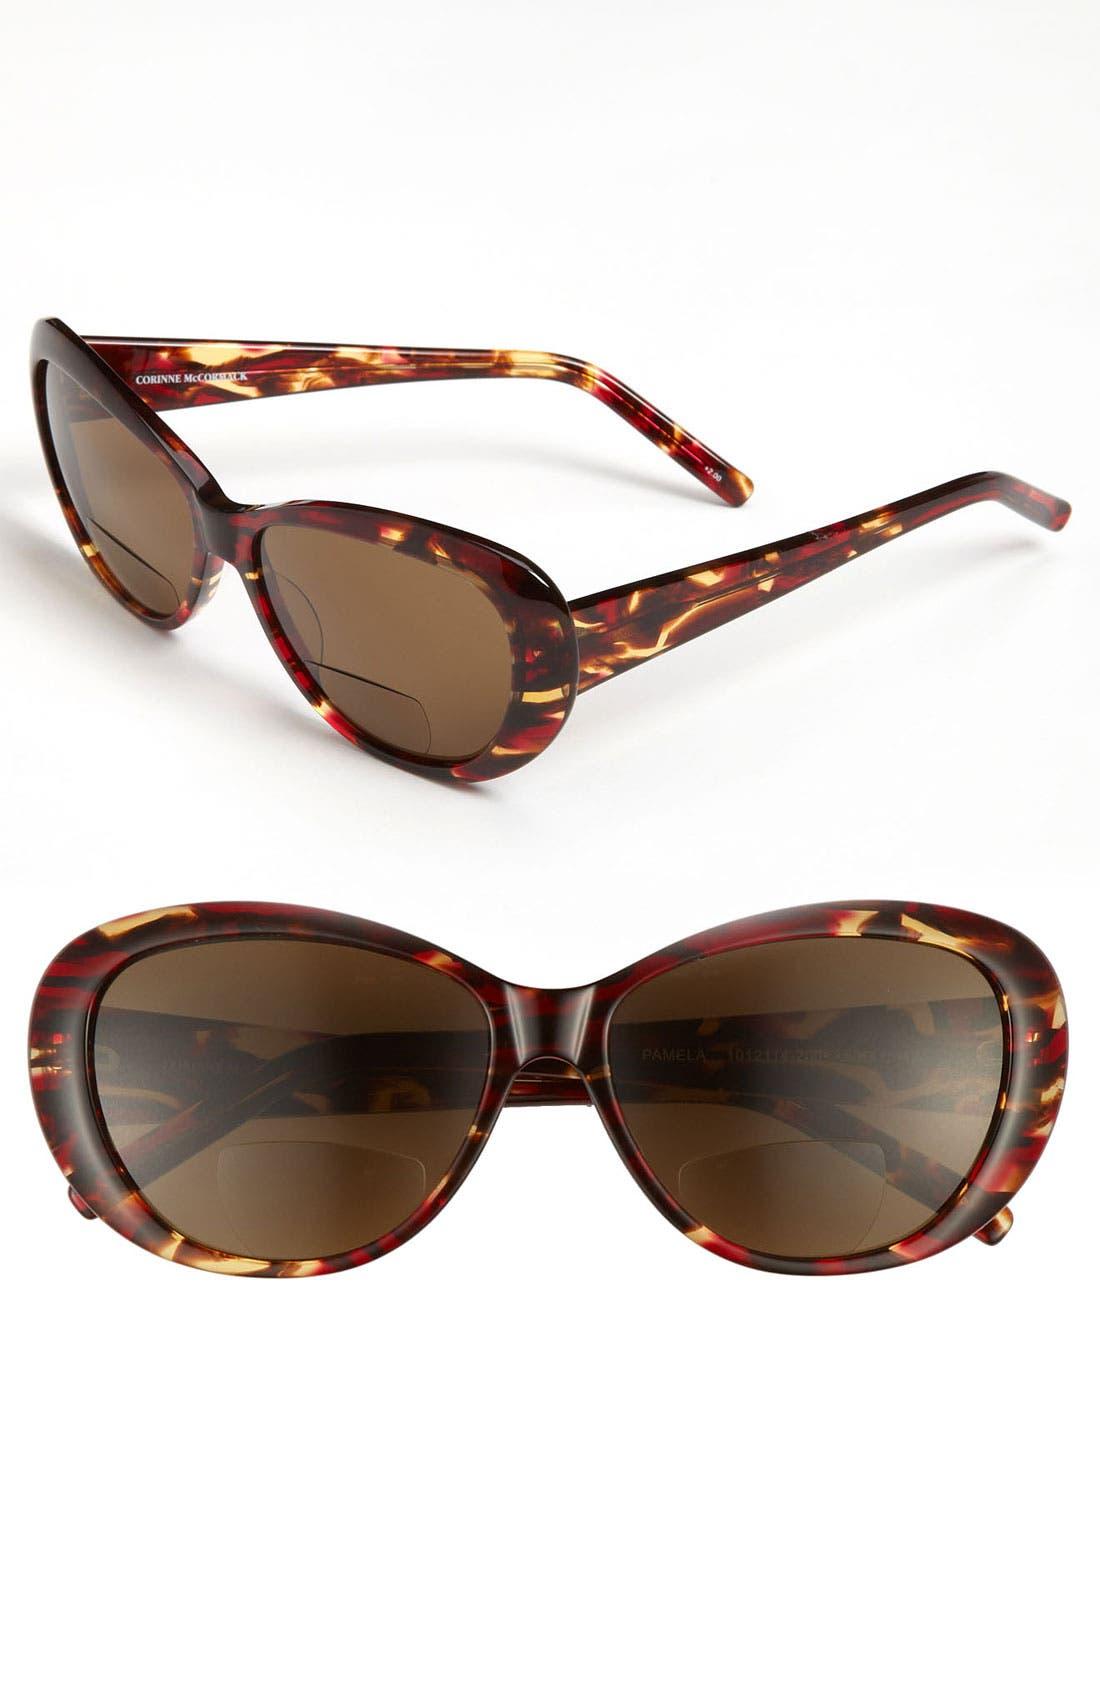 Alternate Image 1 Selected - Corinne McCormack 56mm Reading Sunglasses